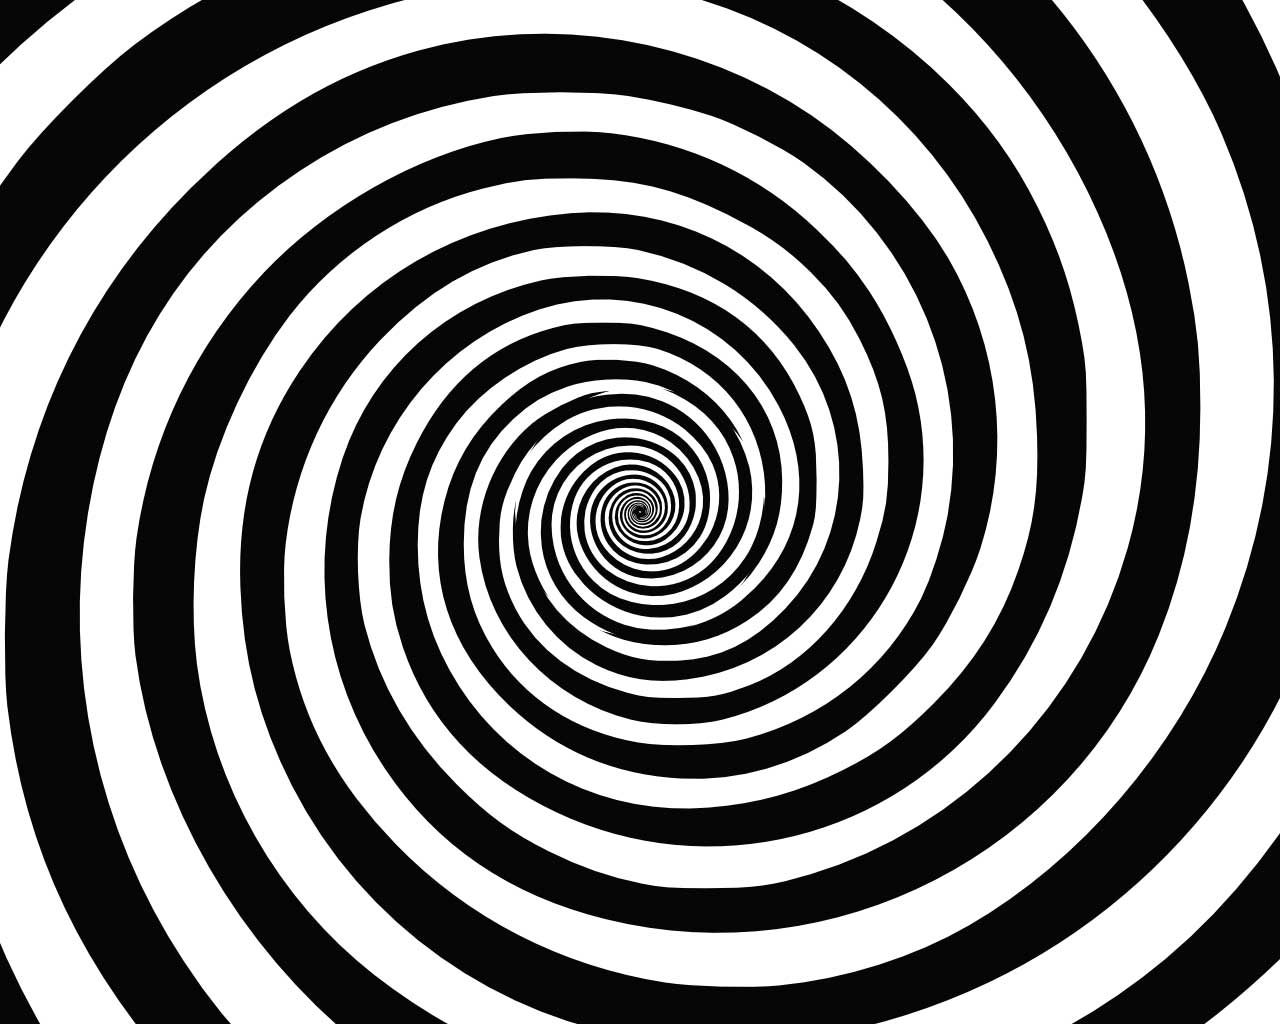 Double_Spiral_1280x1024.jpg